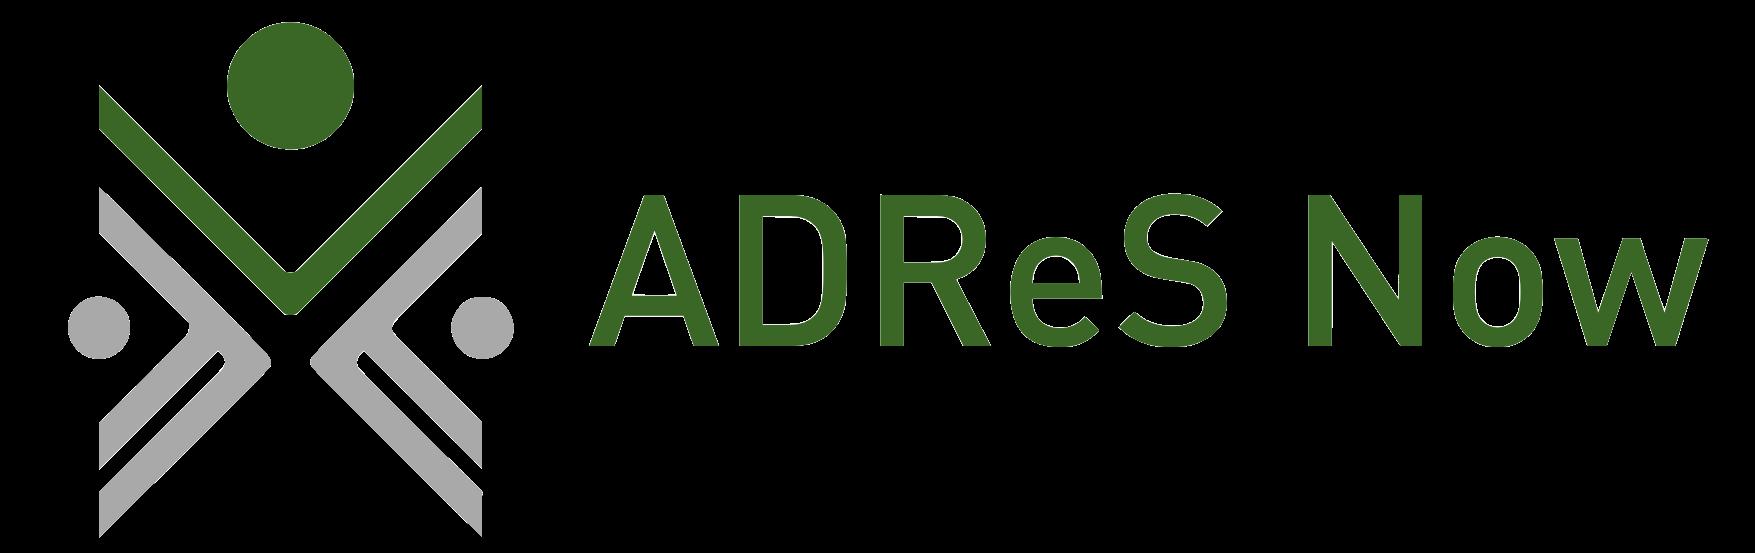 ADReS Now